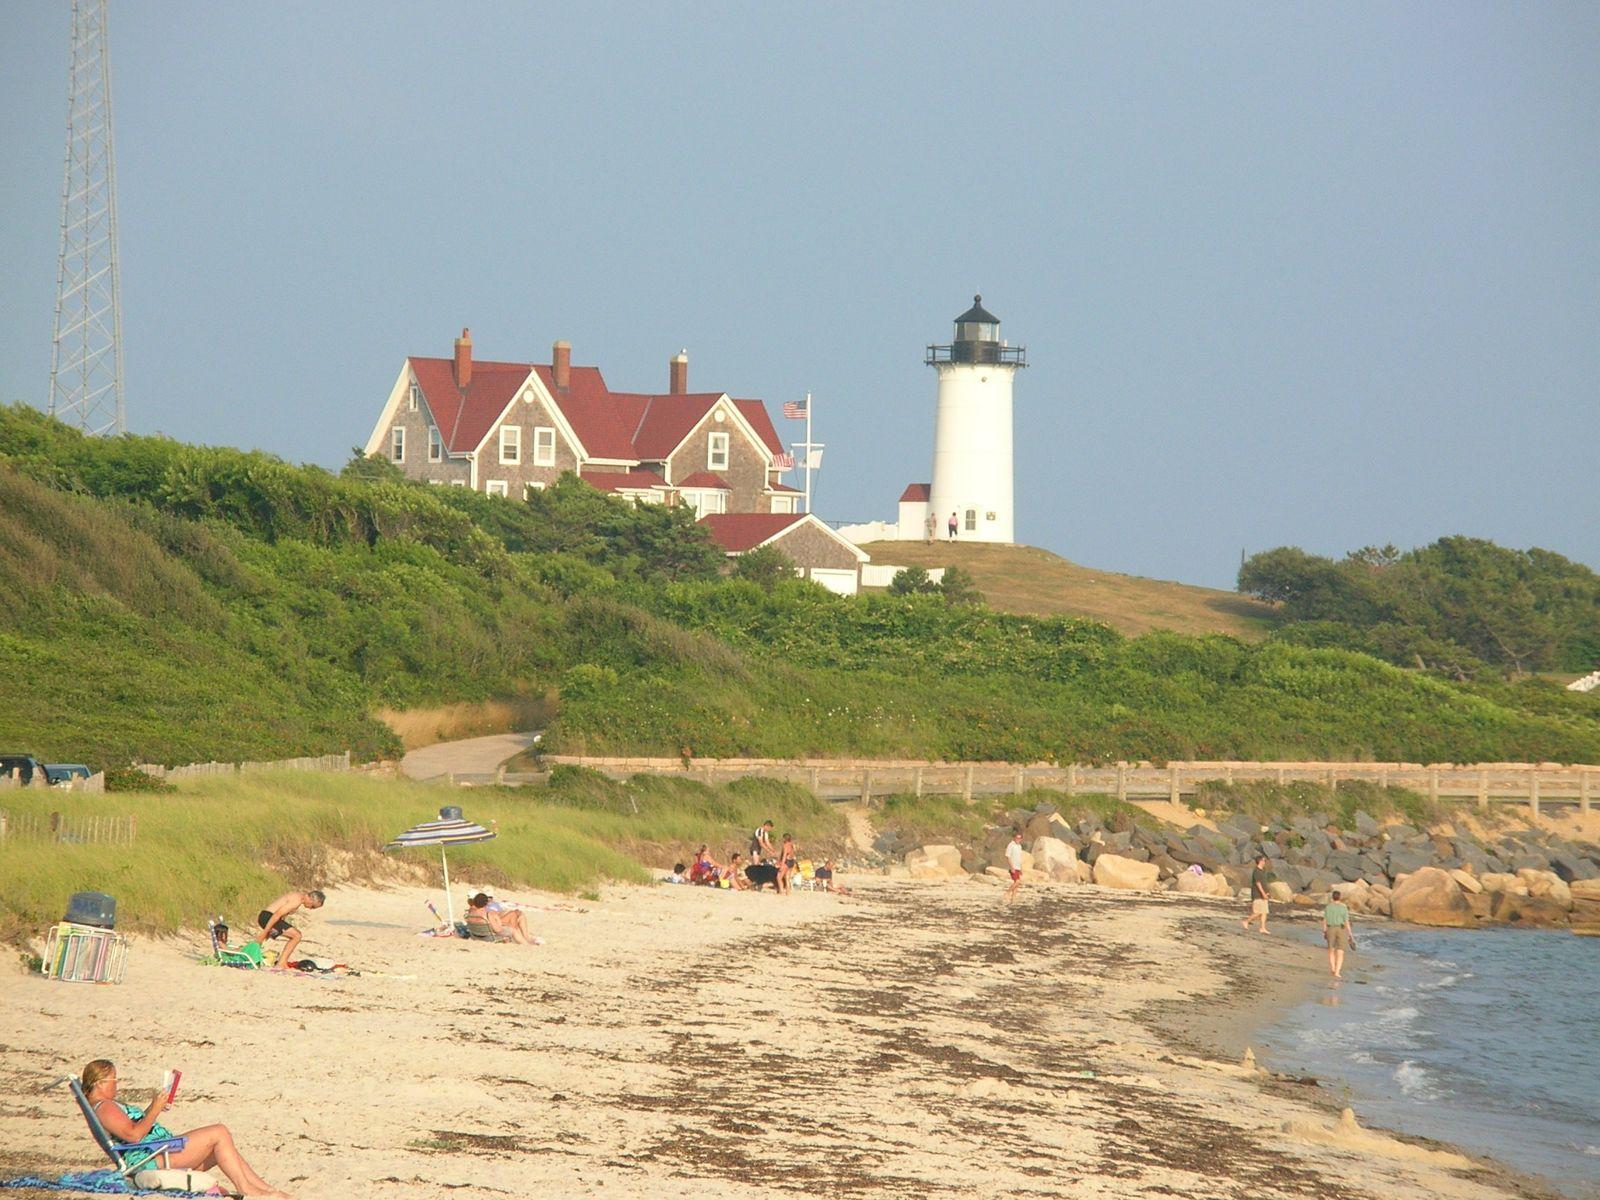 Affordable Cape Cod Living Near Beaches